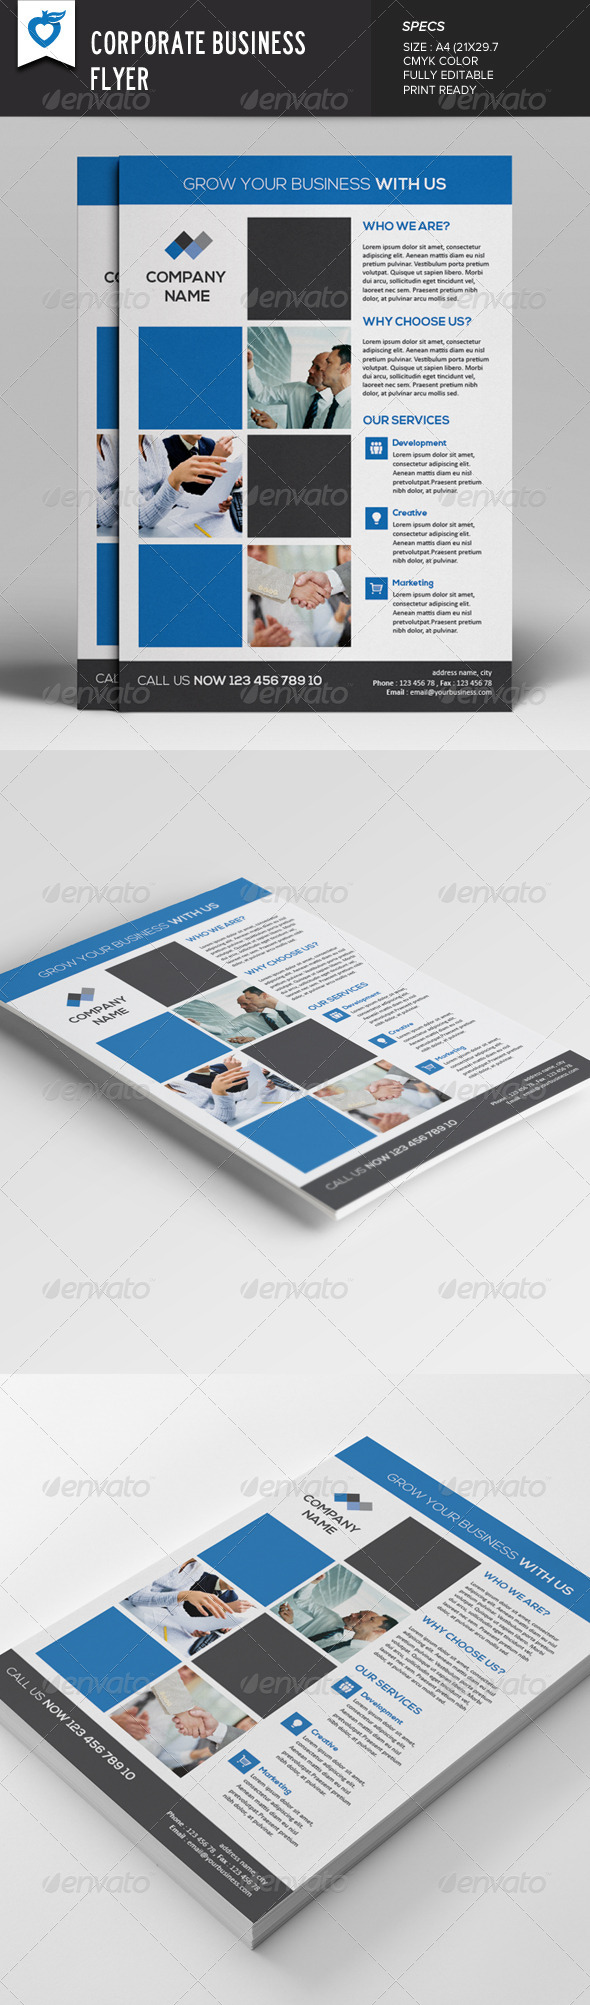 Corporate Business Flyer v5